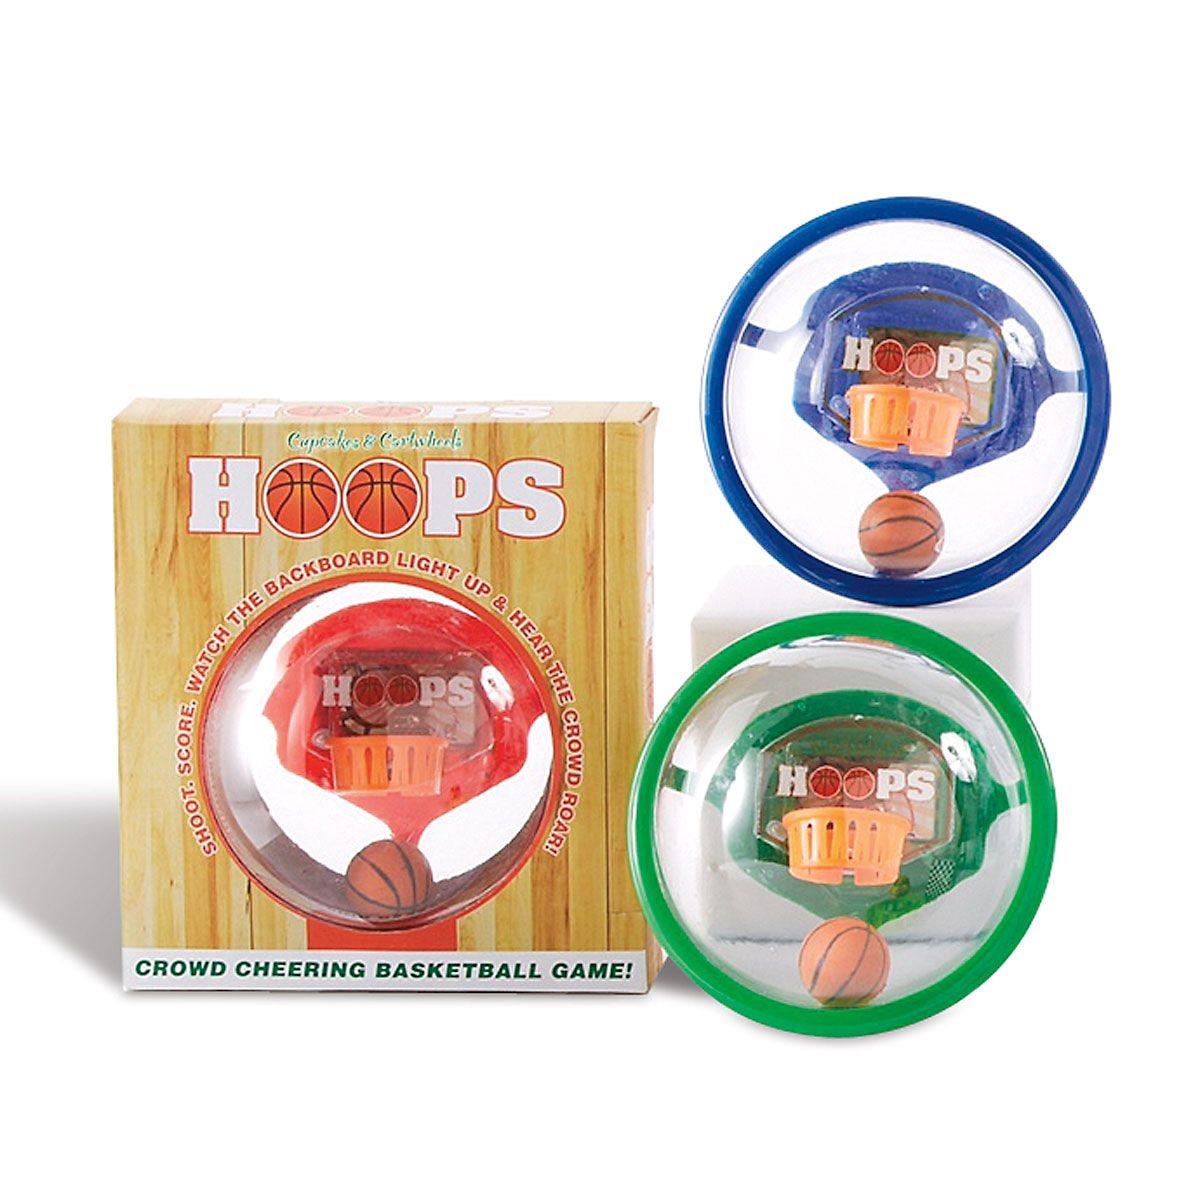 Hoops Basketball Game